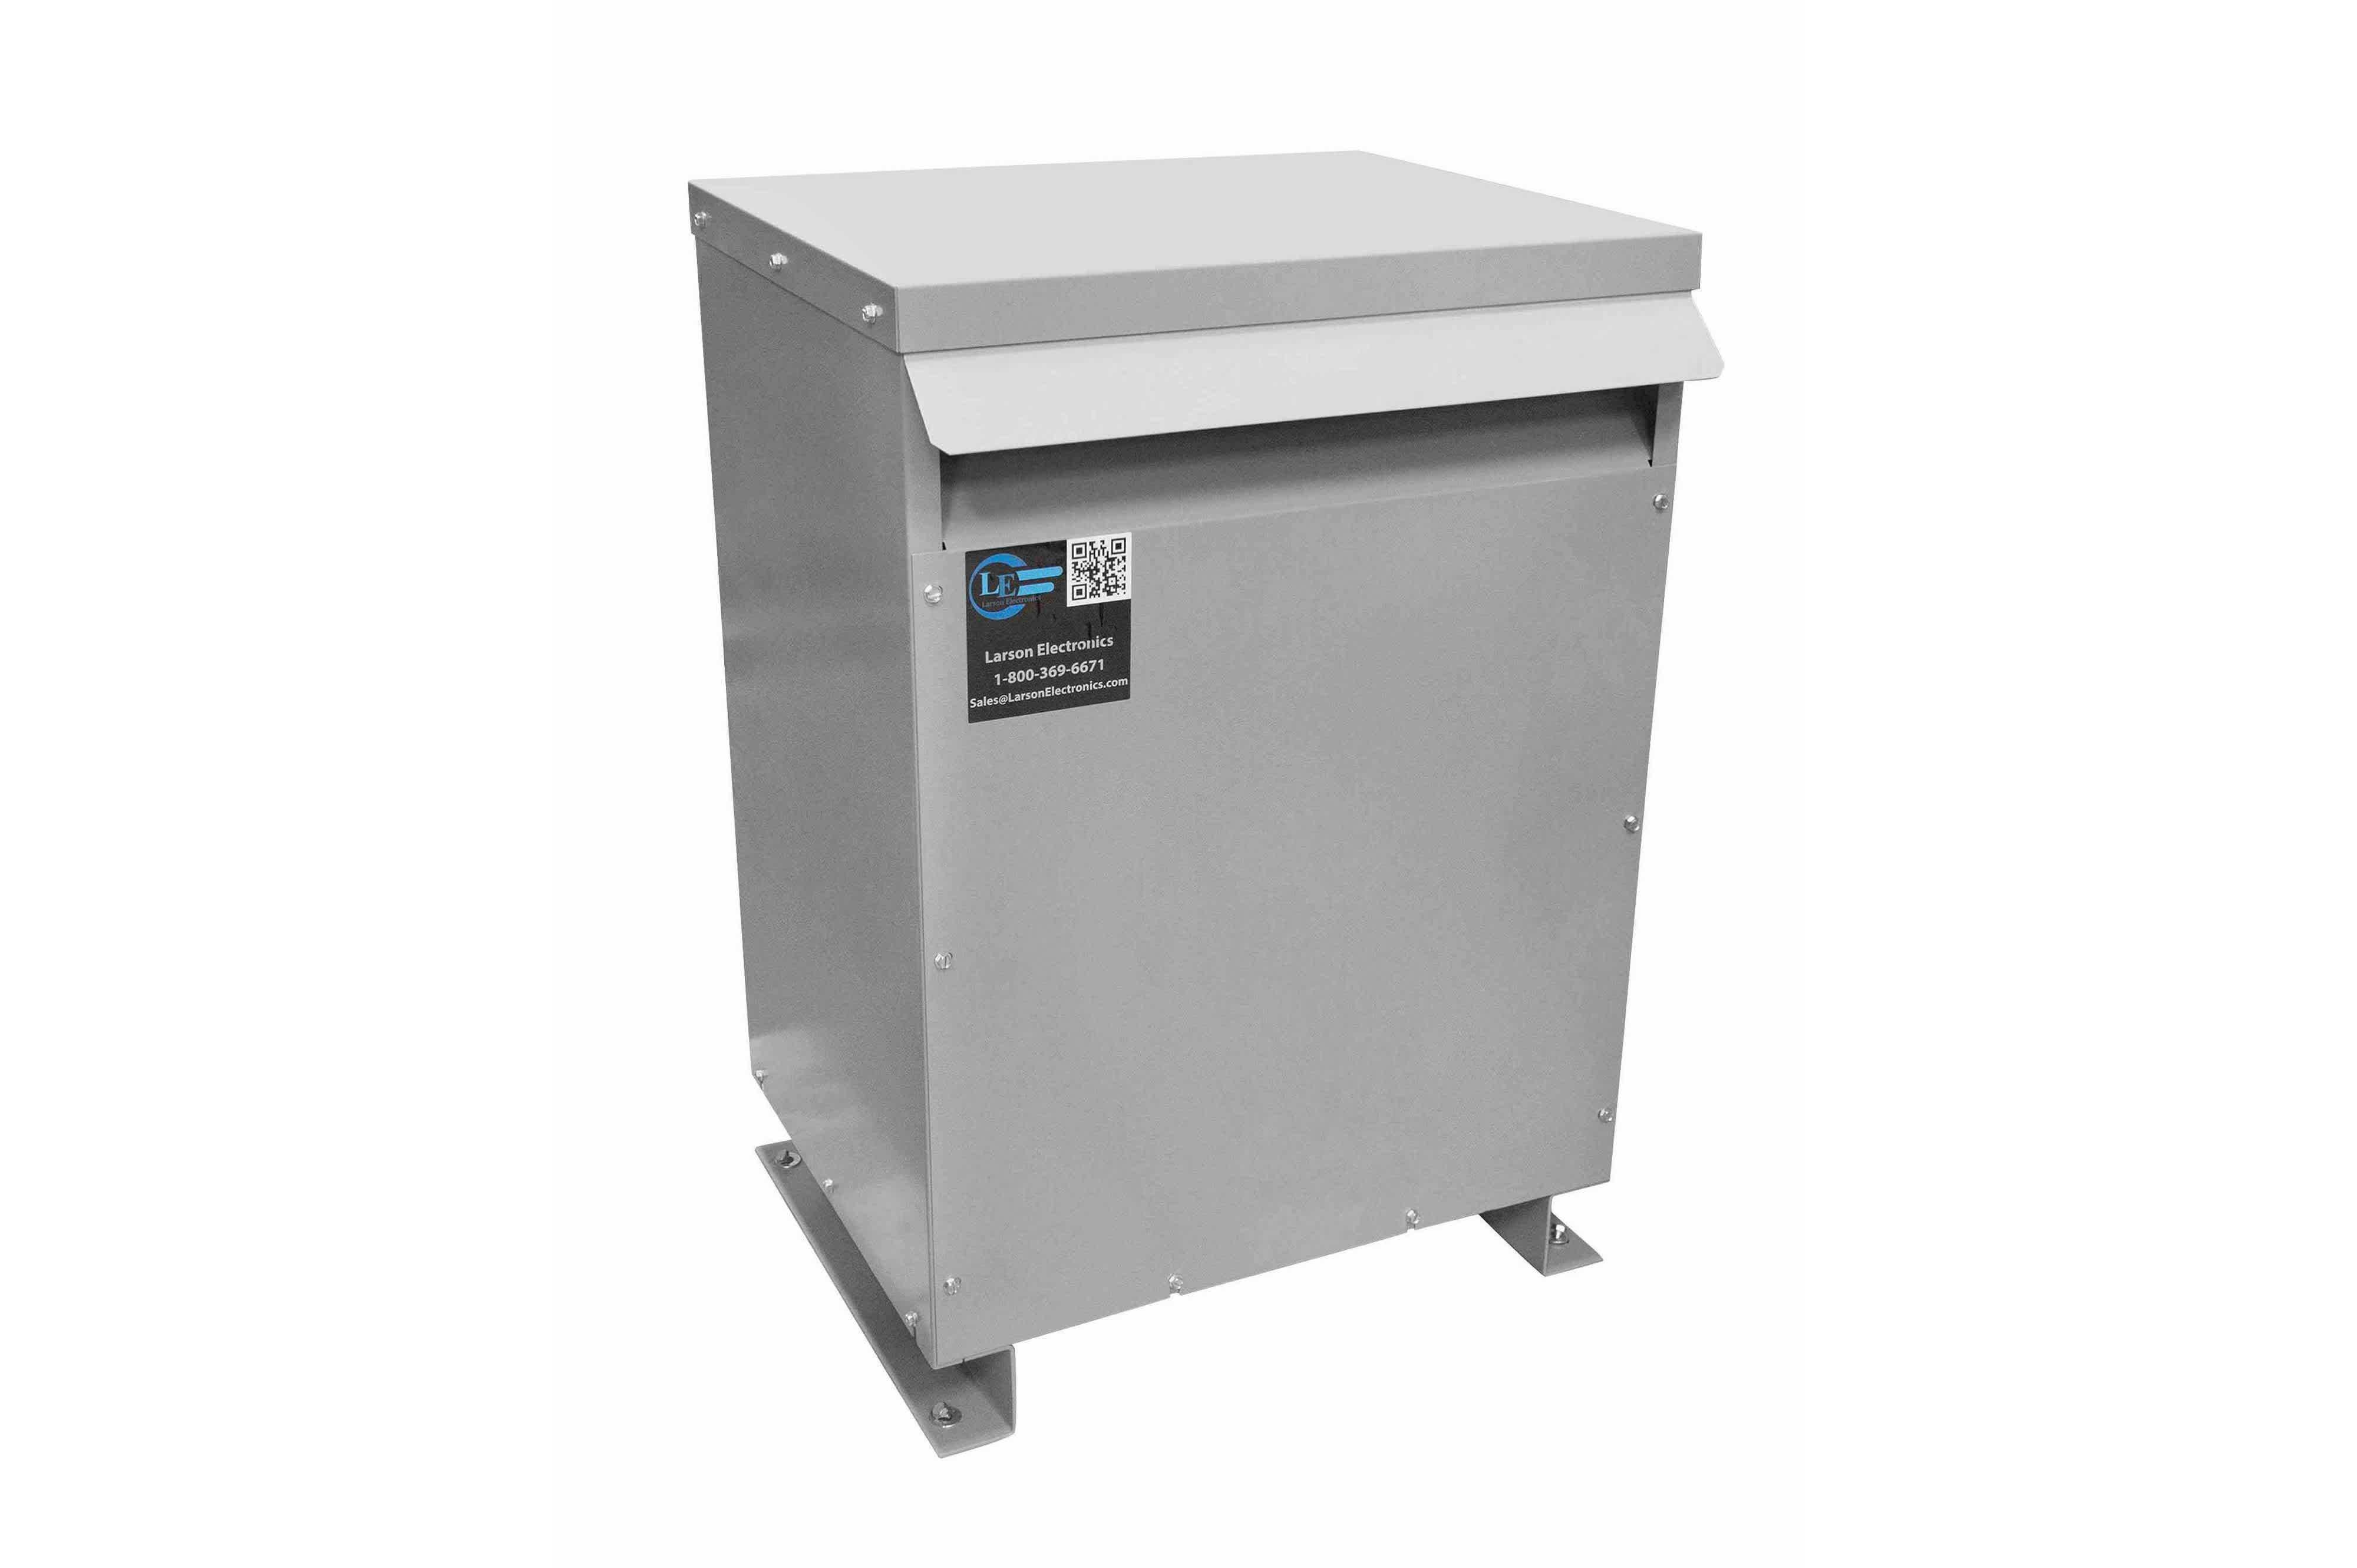 22.5 kVA 3PH Isolation Transformer, 440V Wye Primary, 208Y/120 Wye-N Secondary, N3R, Ventilated, 60 Hz